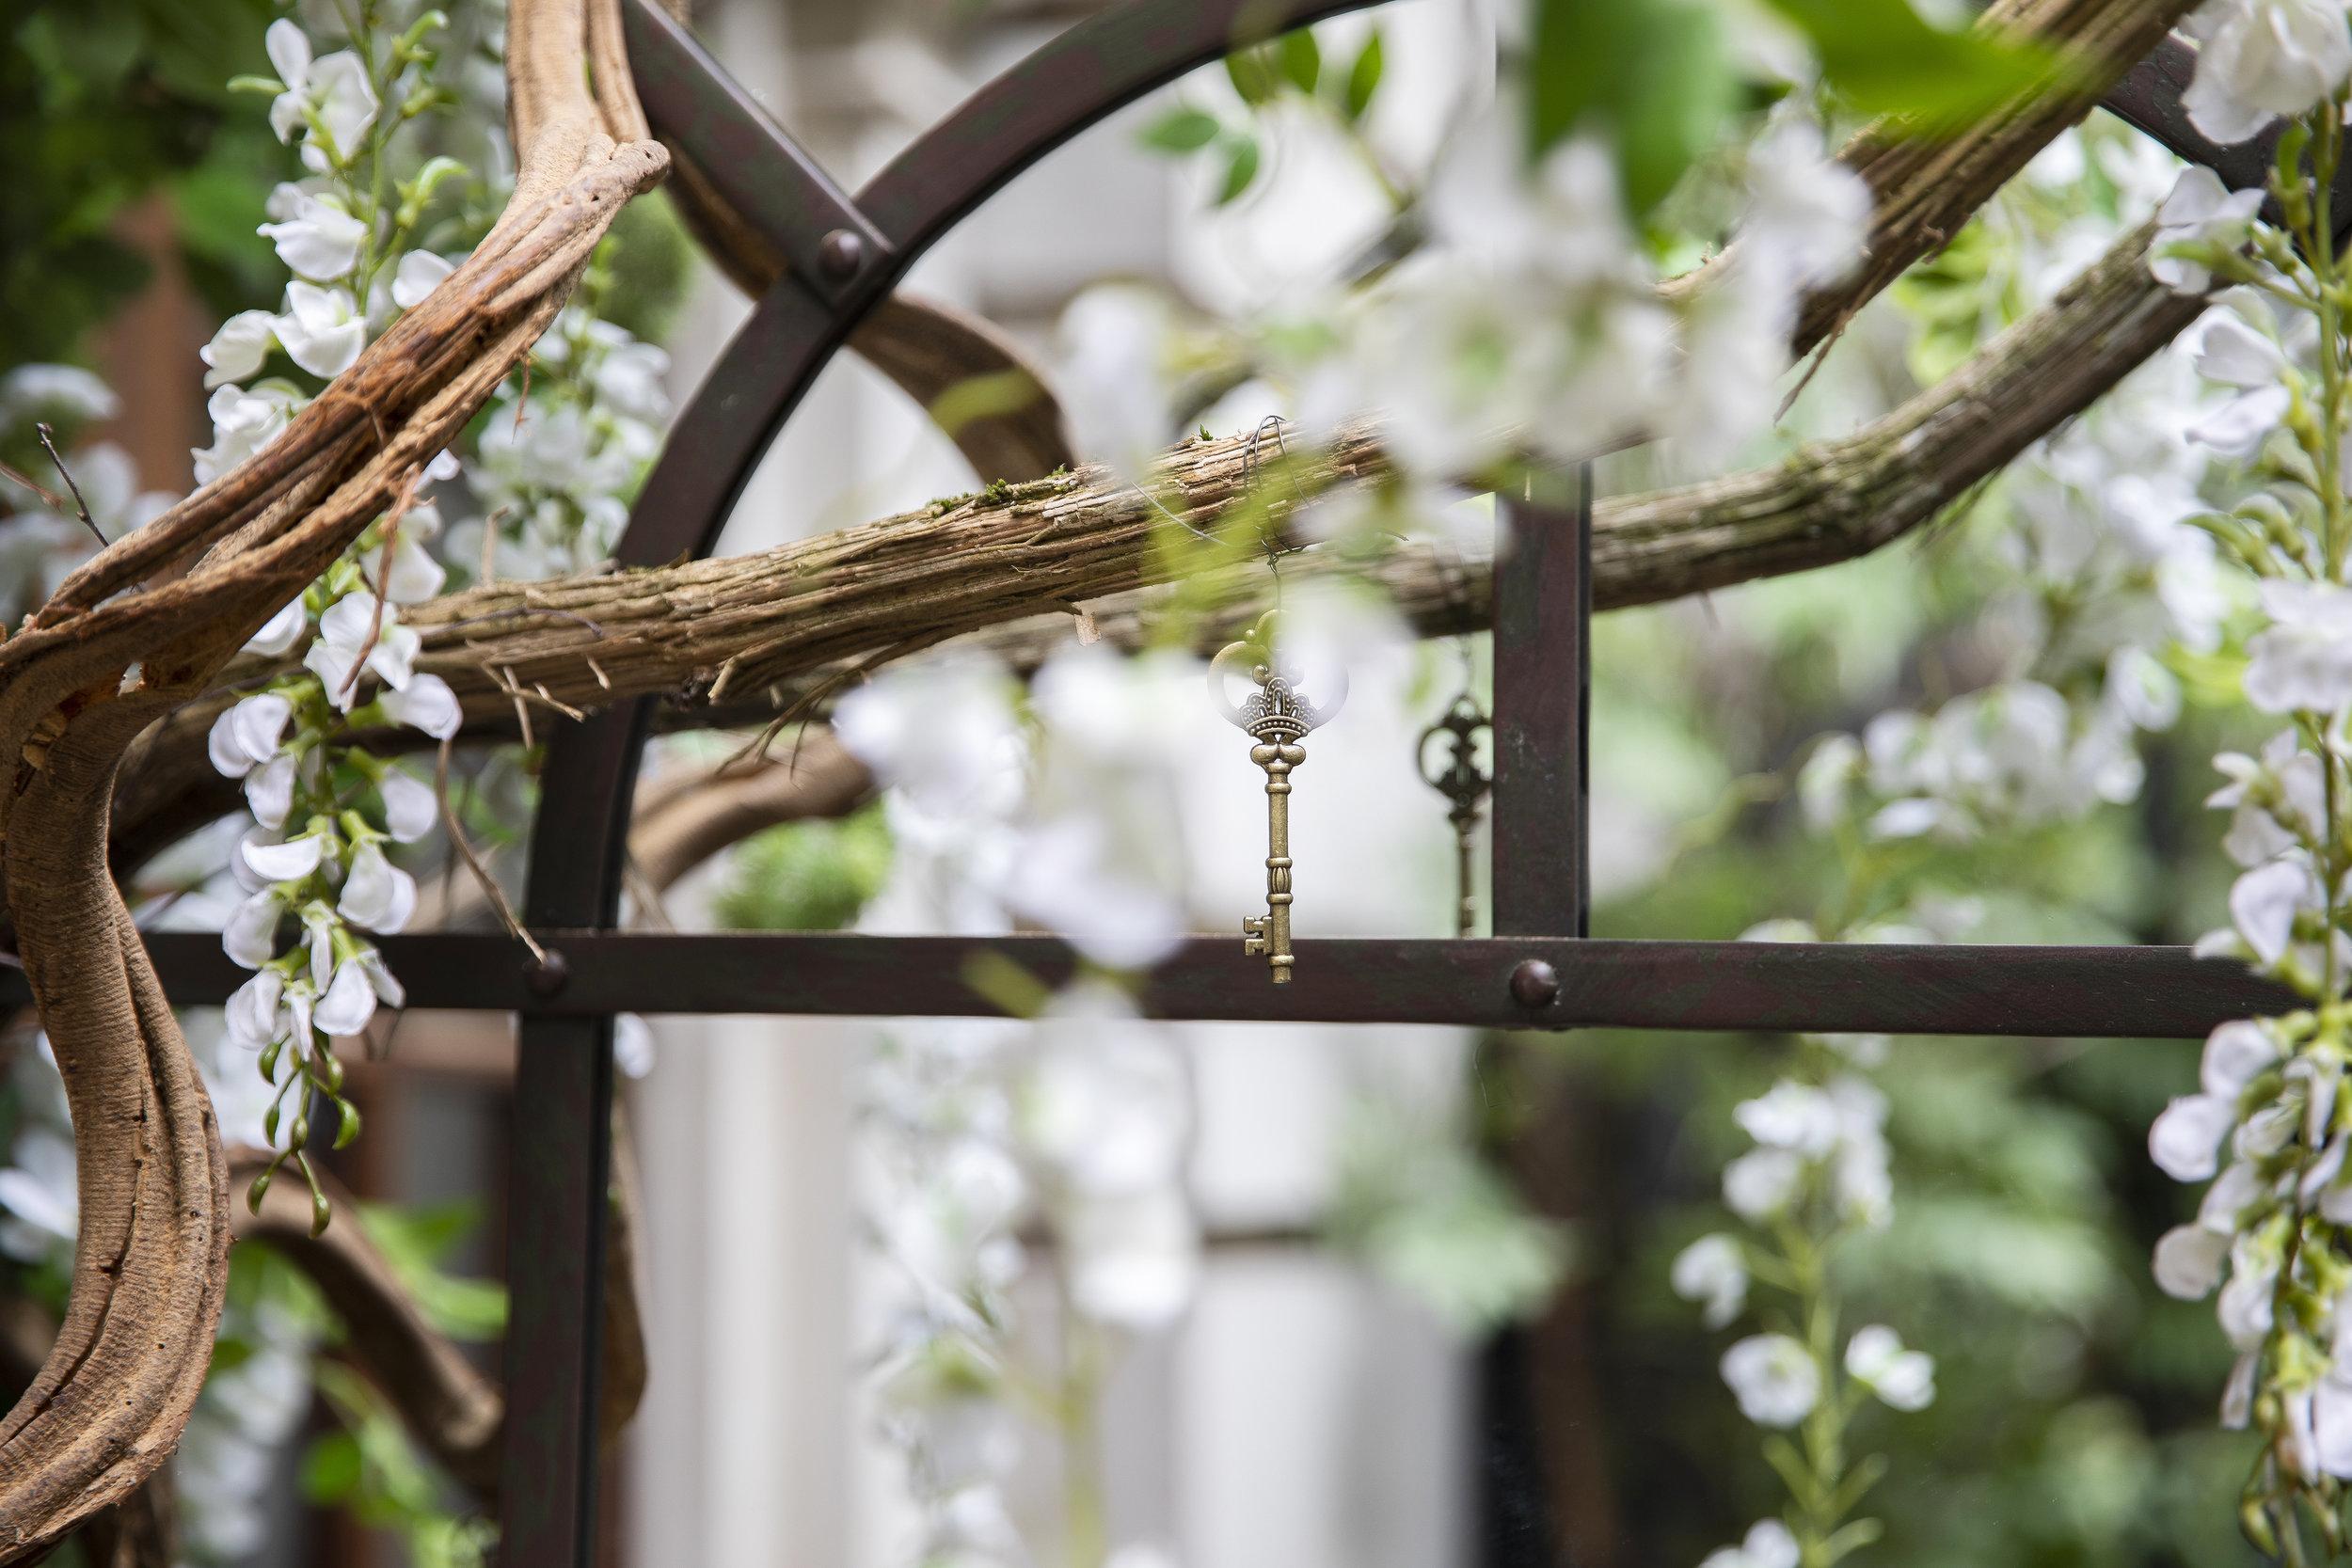 The Nyetimber Secret Garden - Rosewood Hotel, London